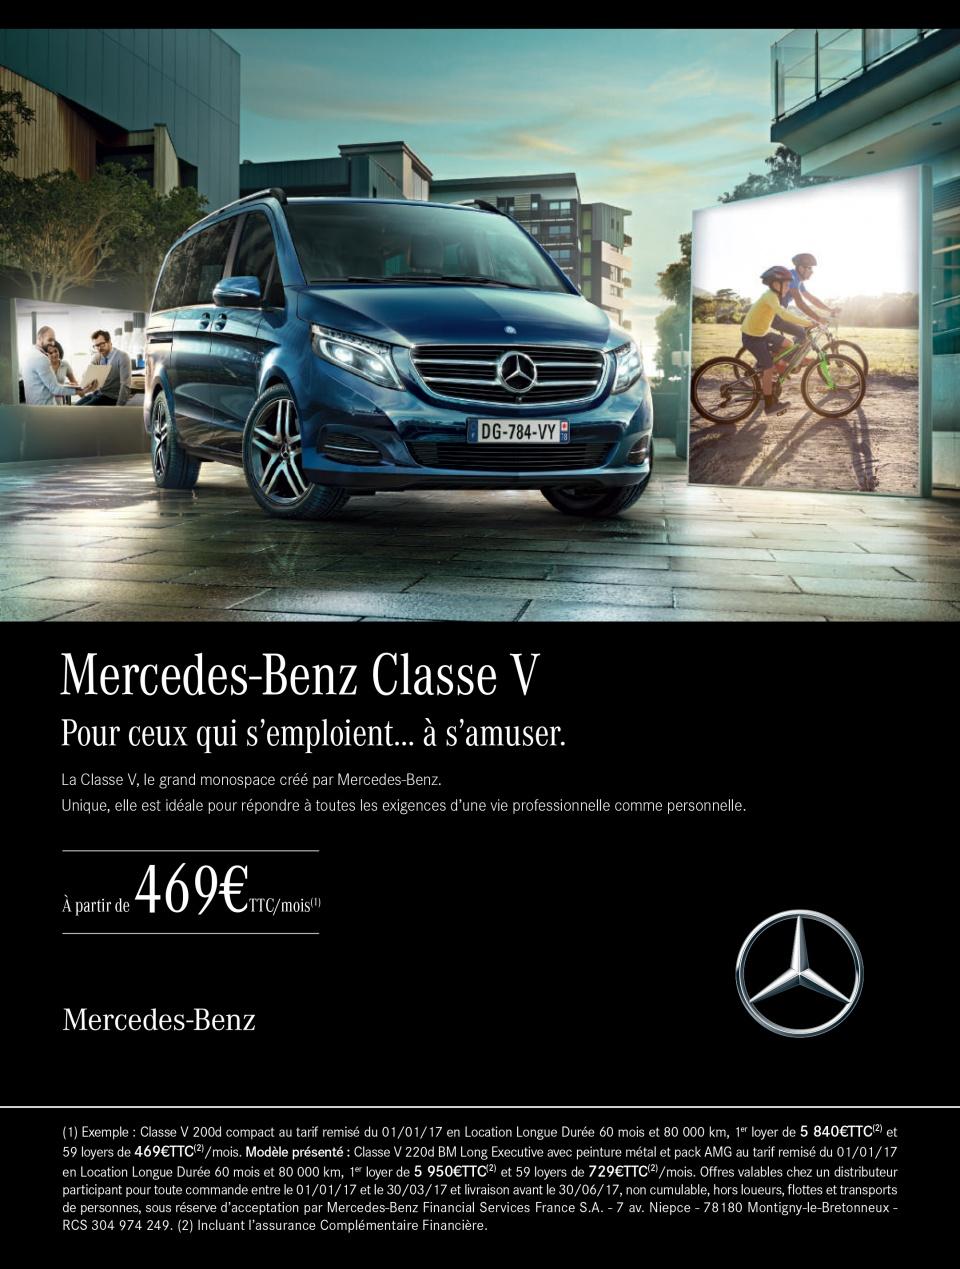 Mercedes Classe V #1